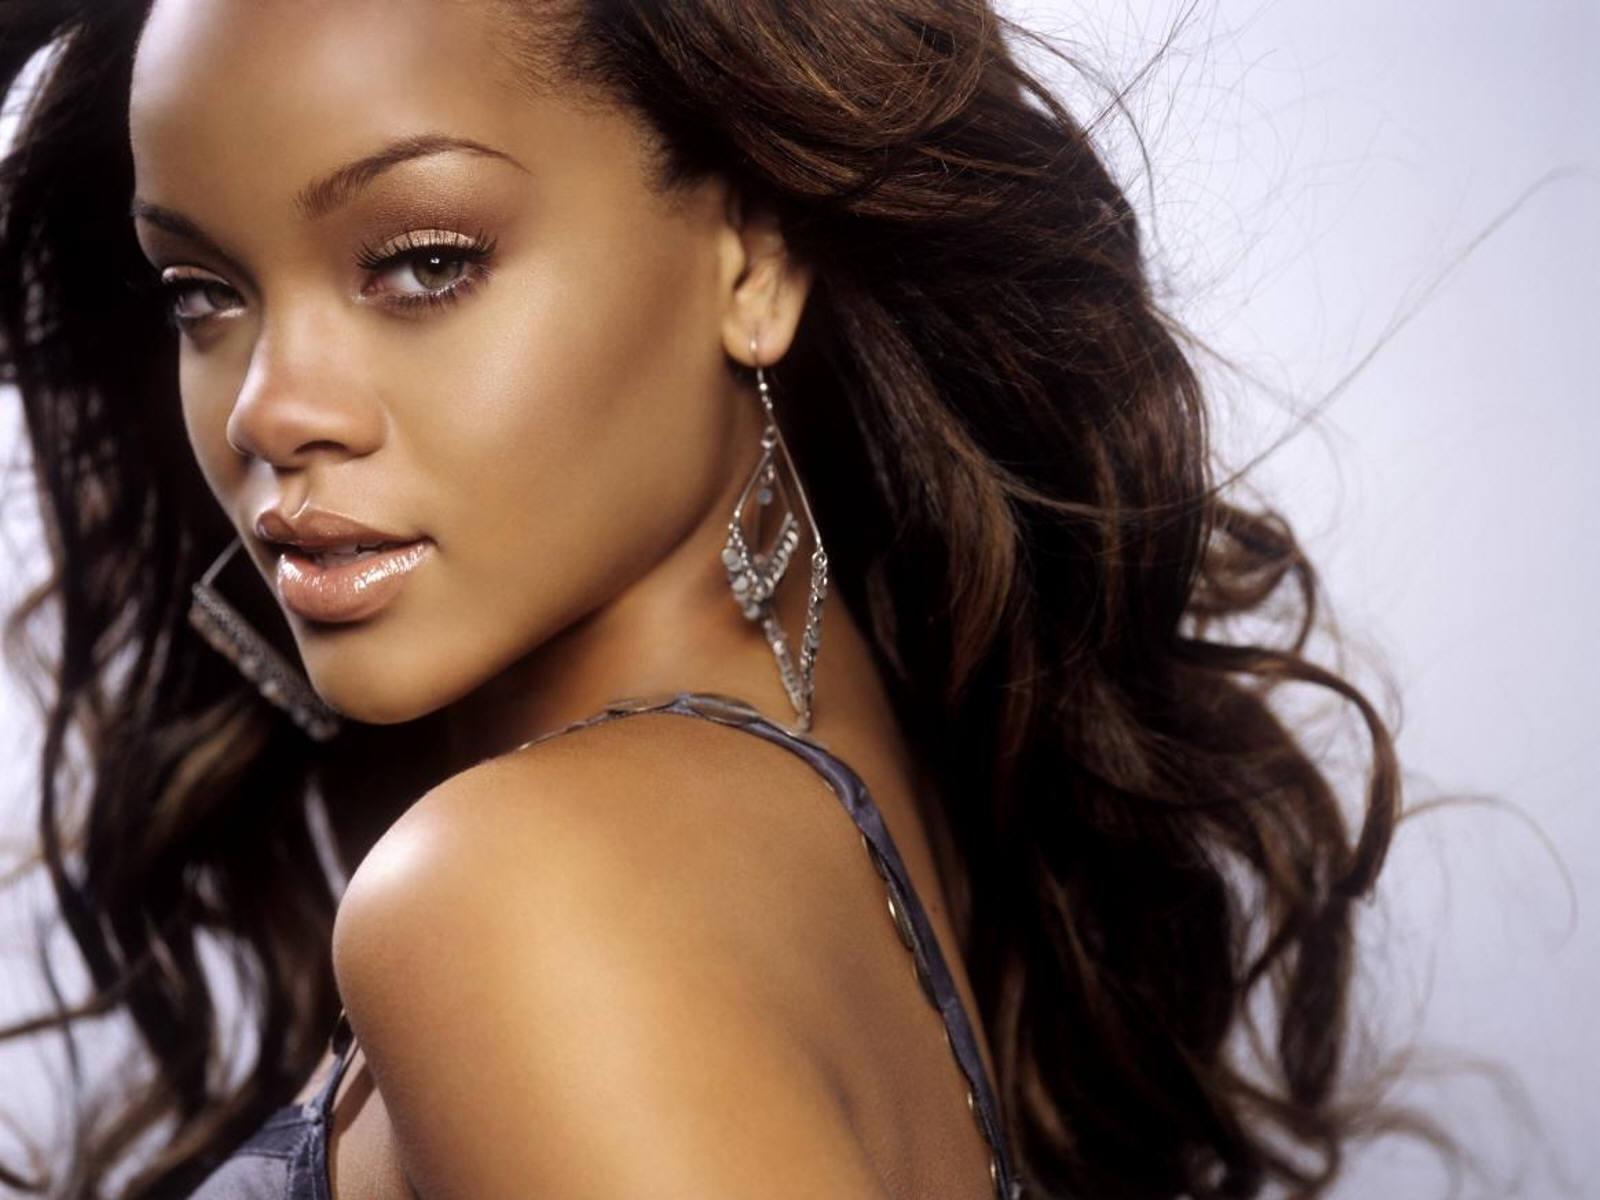 Rihanna Bikini Wallpapers Picture 6